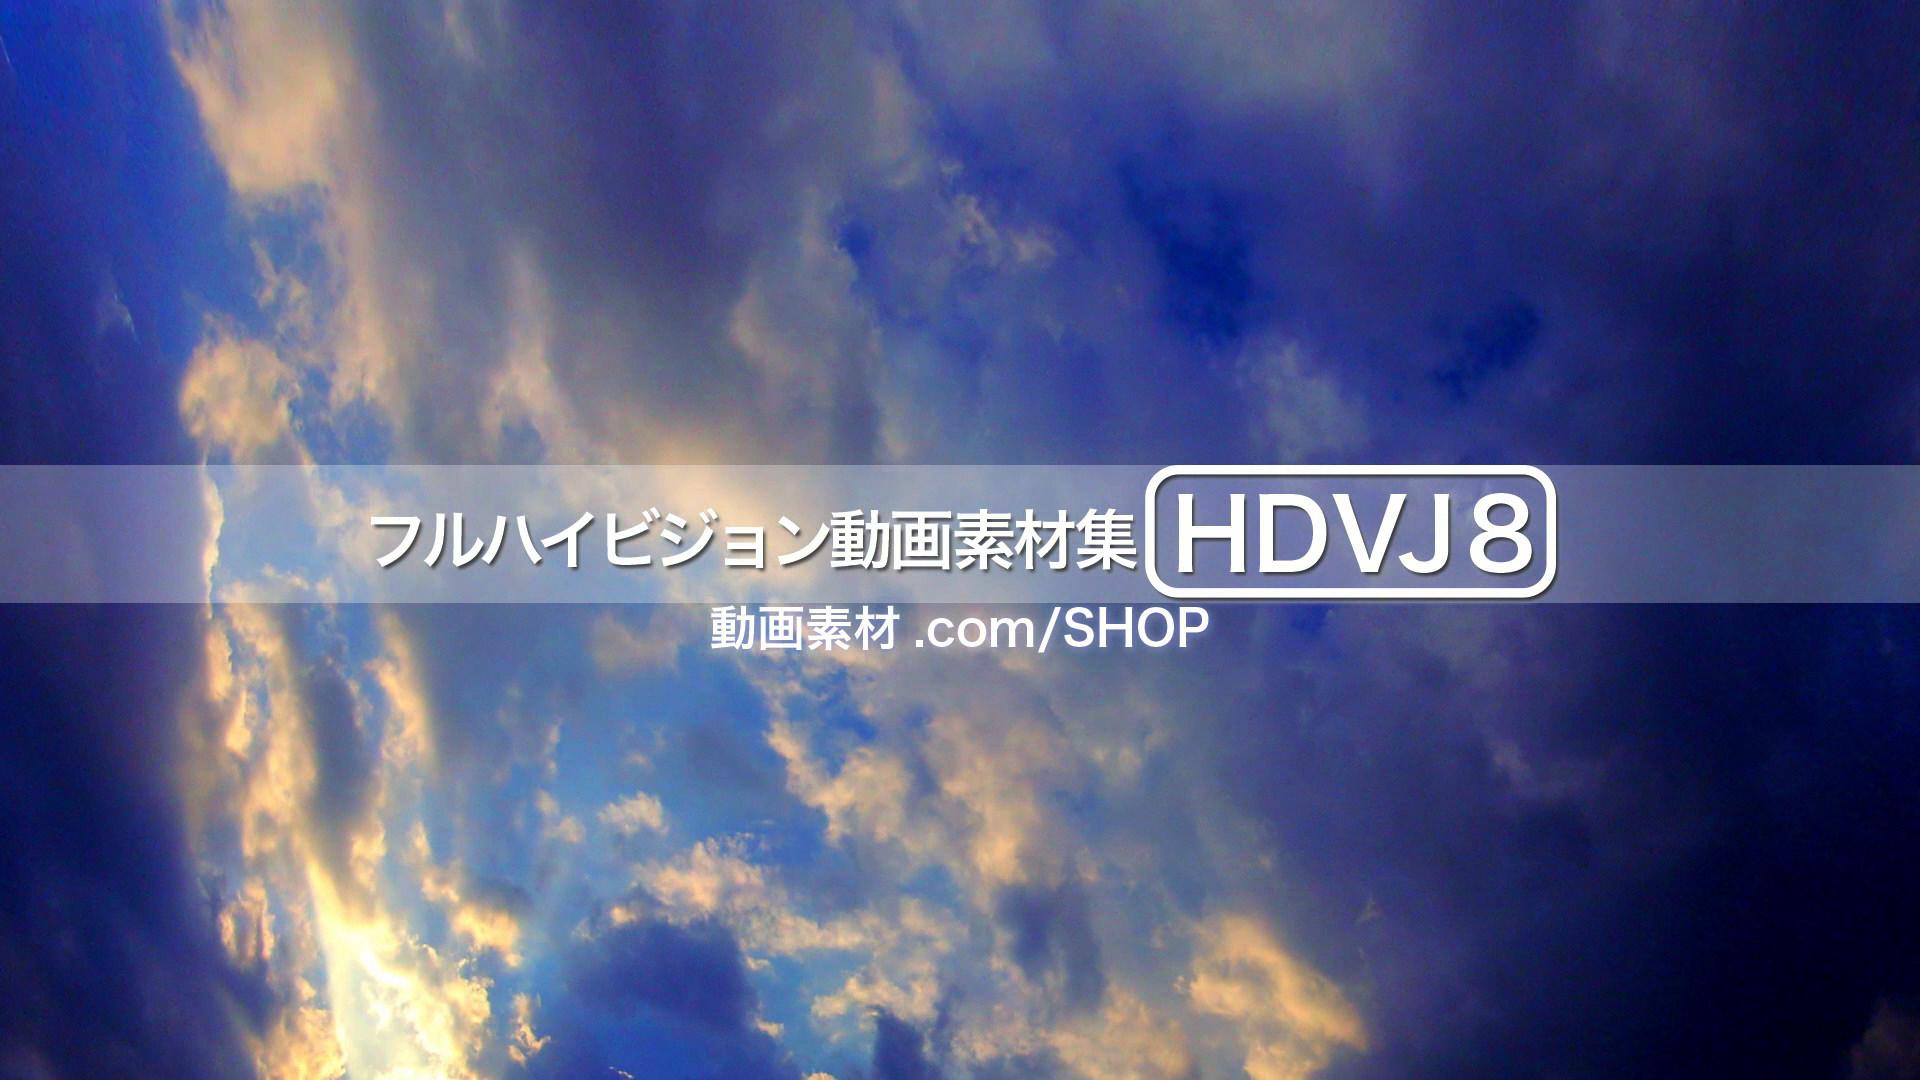 MovieMaterial HDVJ8 フルハイビジョンVJ動画素材集 画像7